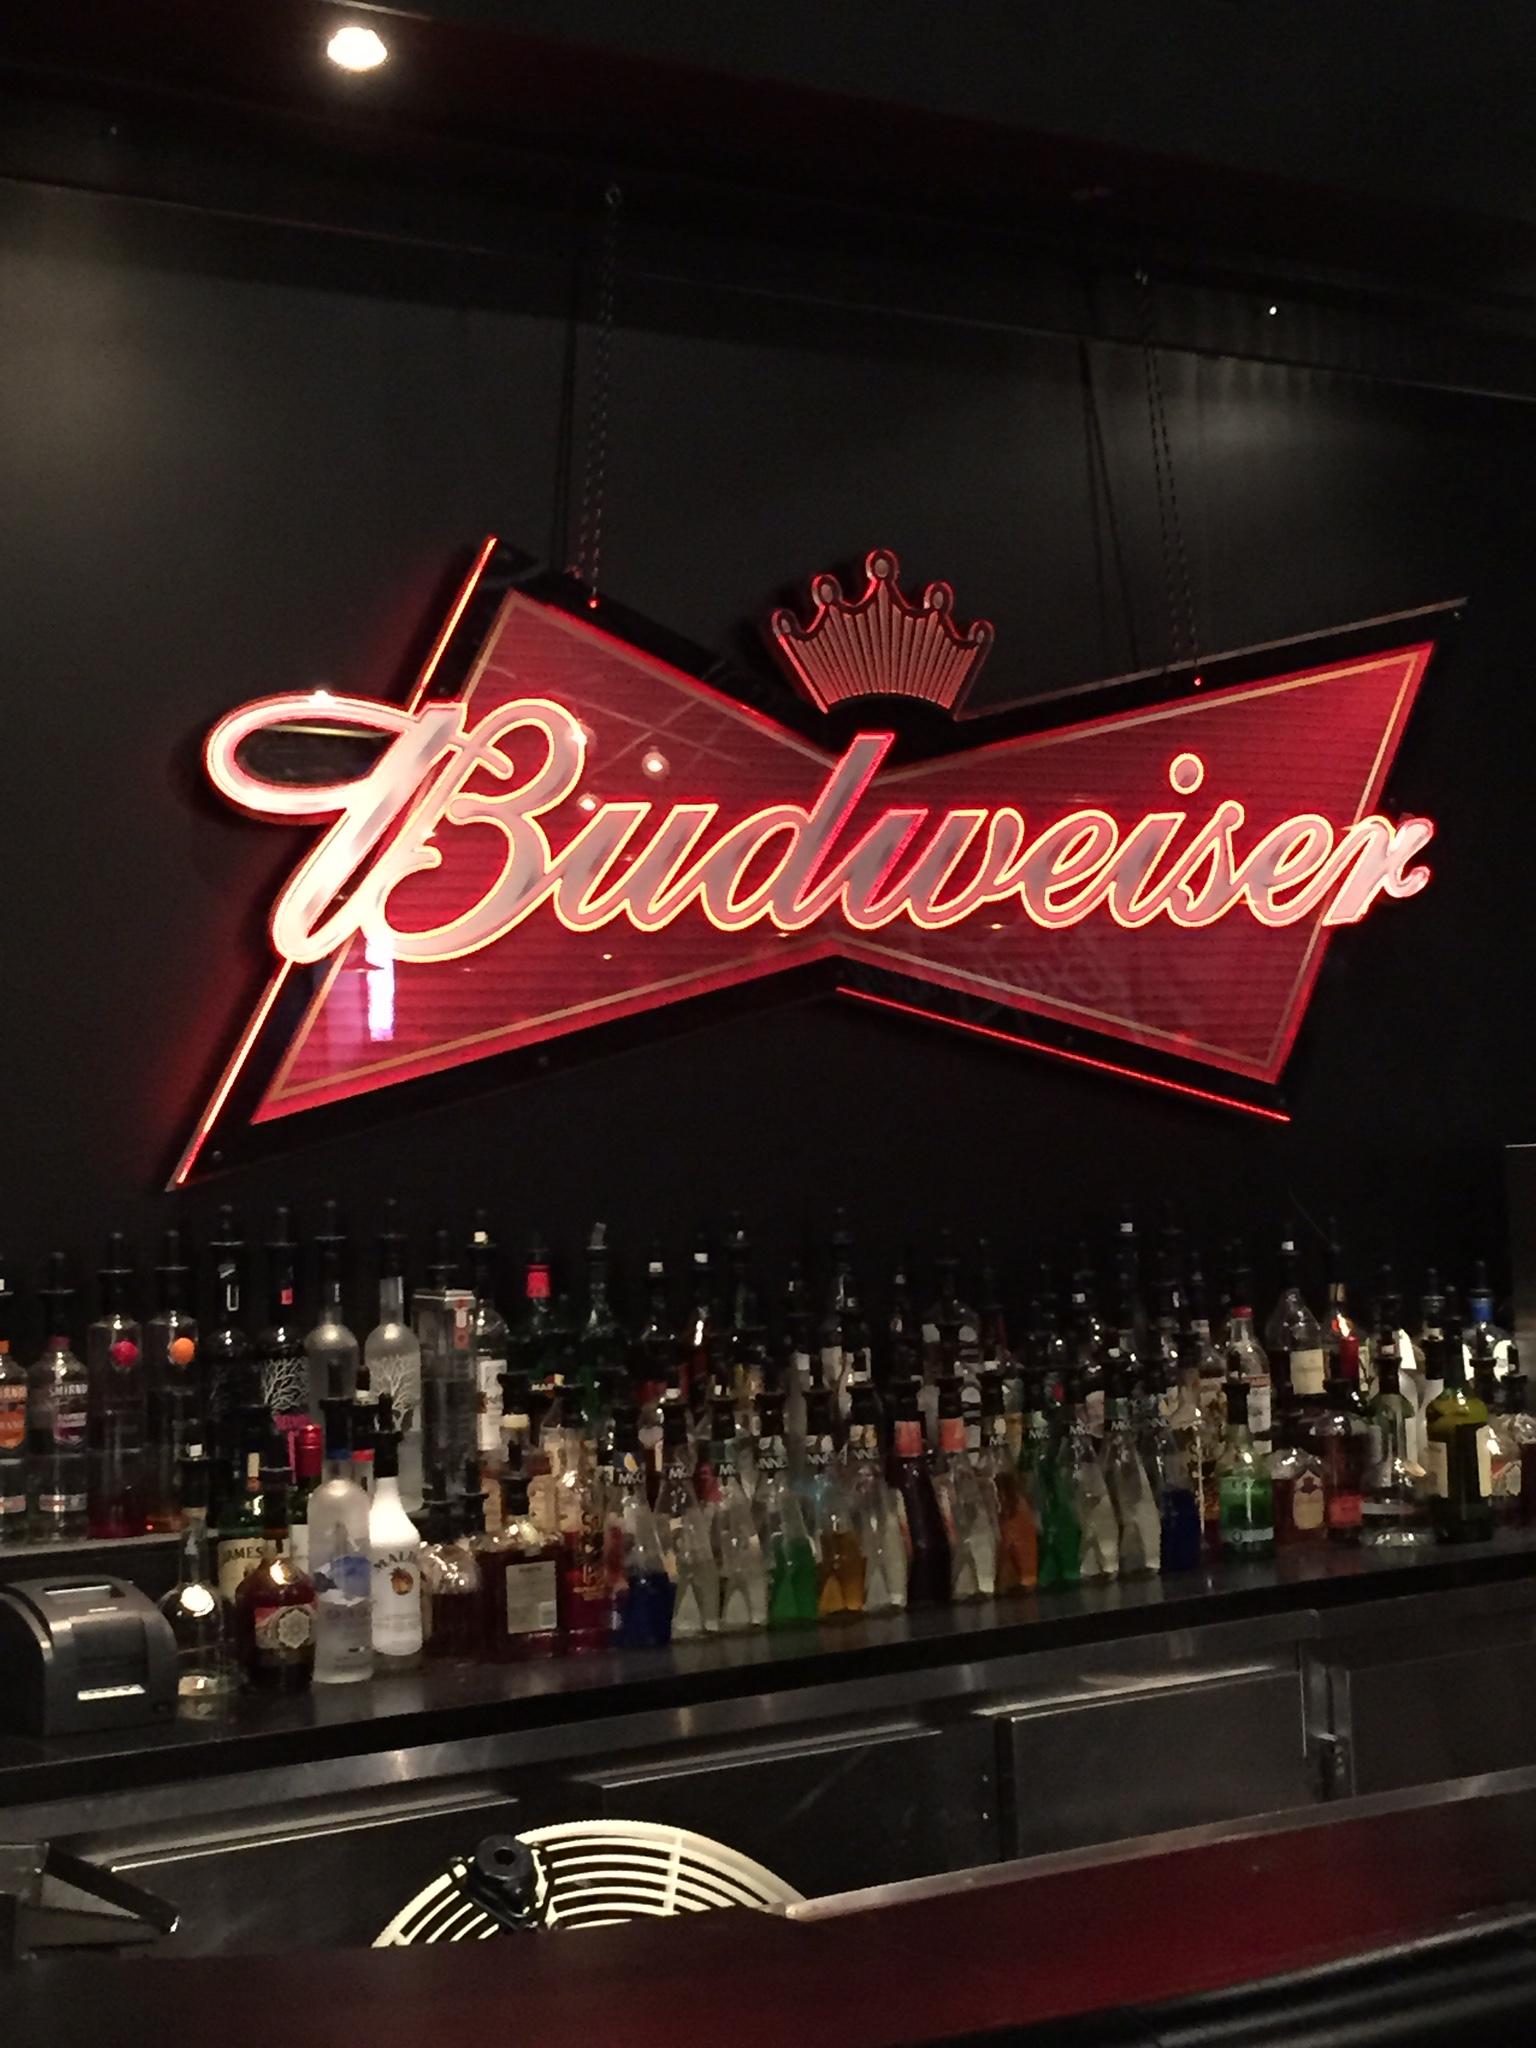 Budweiser Light-up LED sign